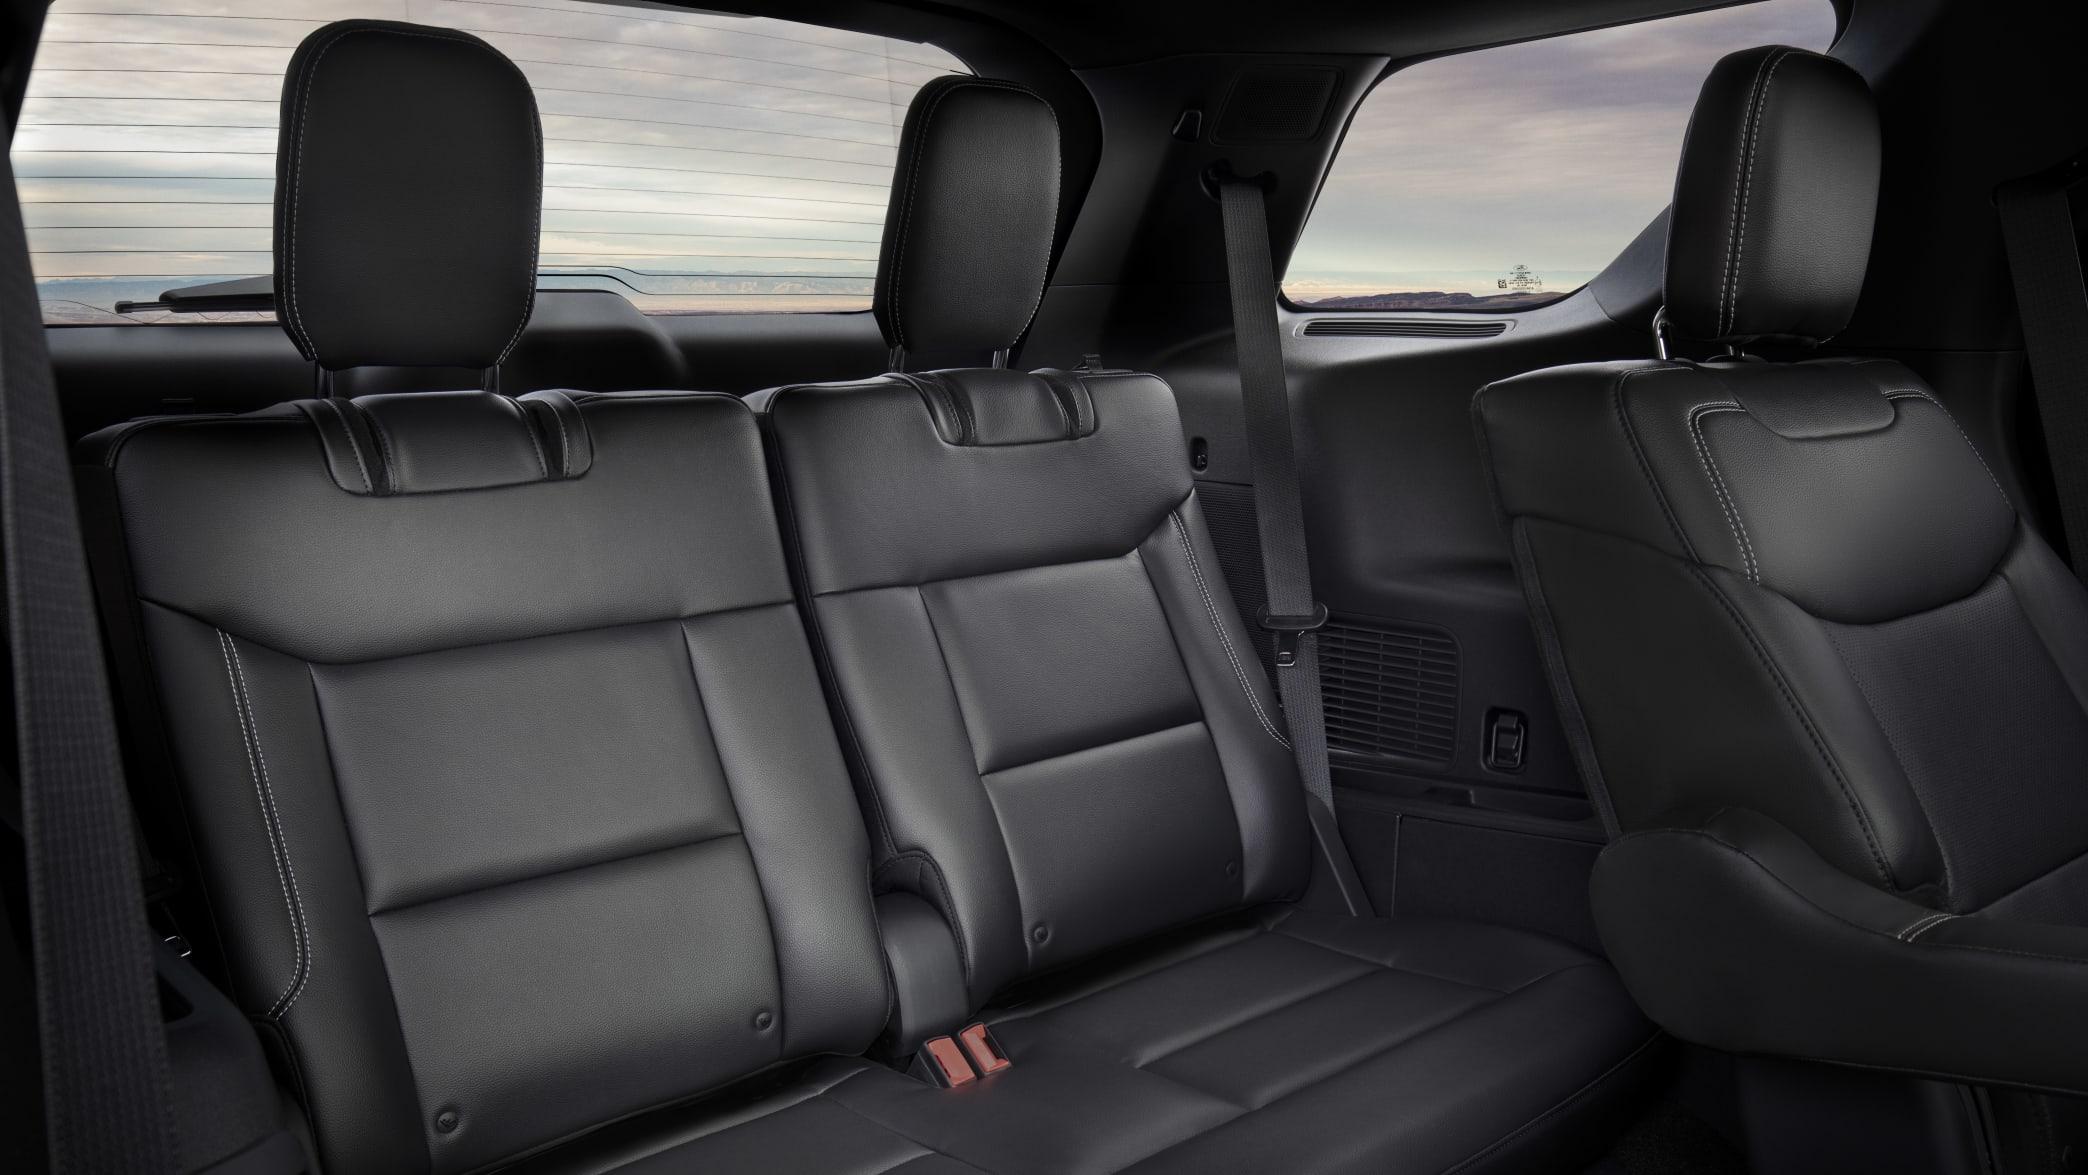 Blick auf die Rückbank des Ford Explorer ST